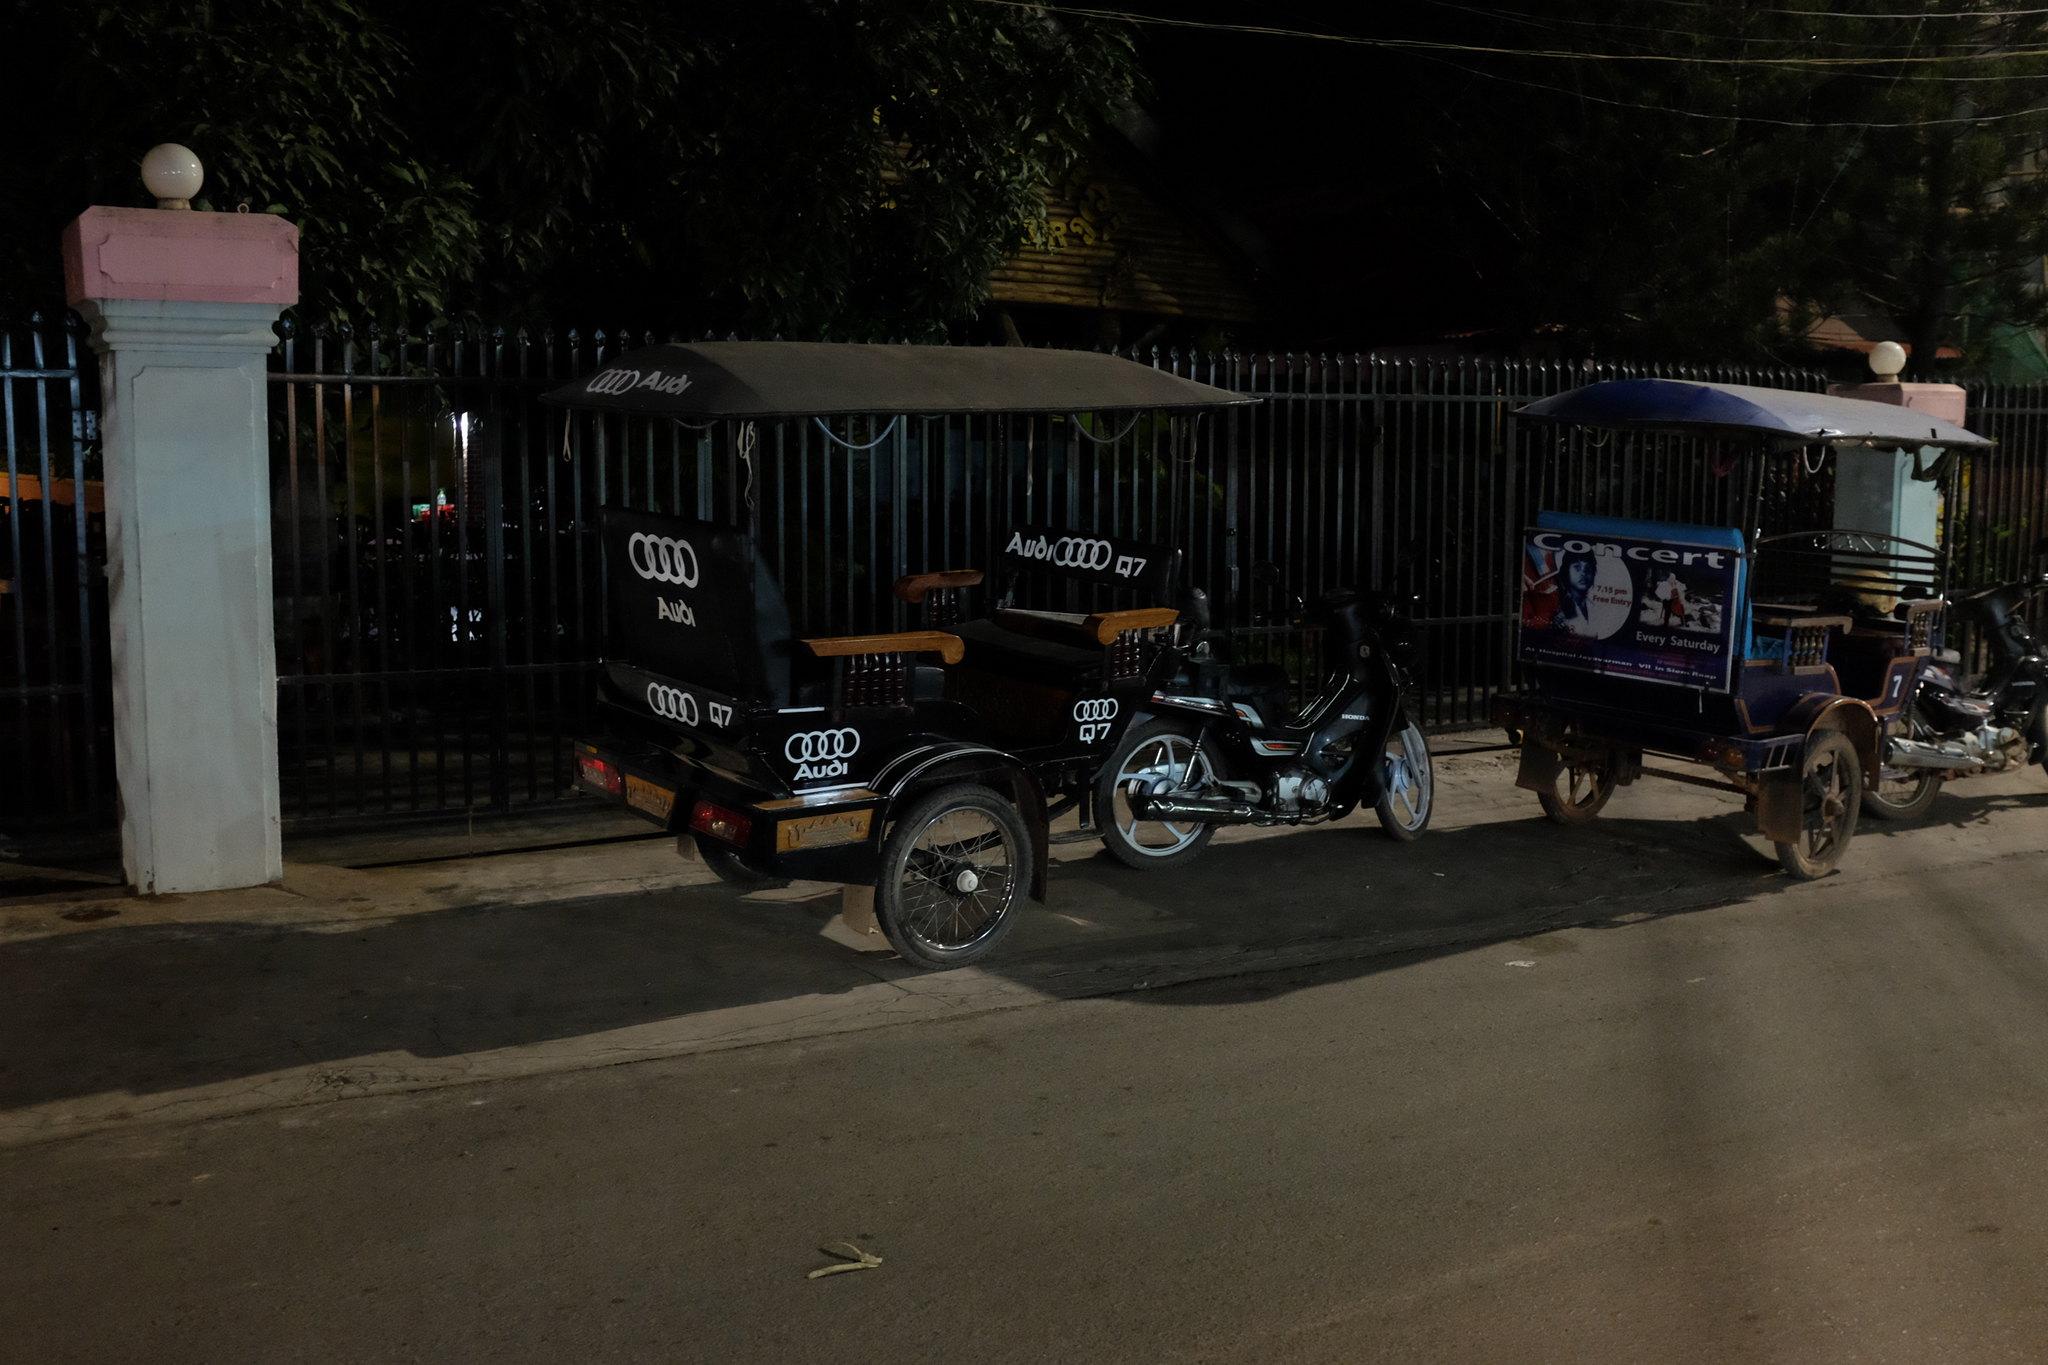 Kambodscha u. a. auf Krücken